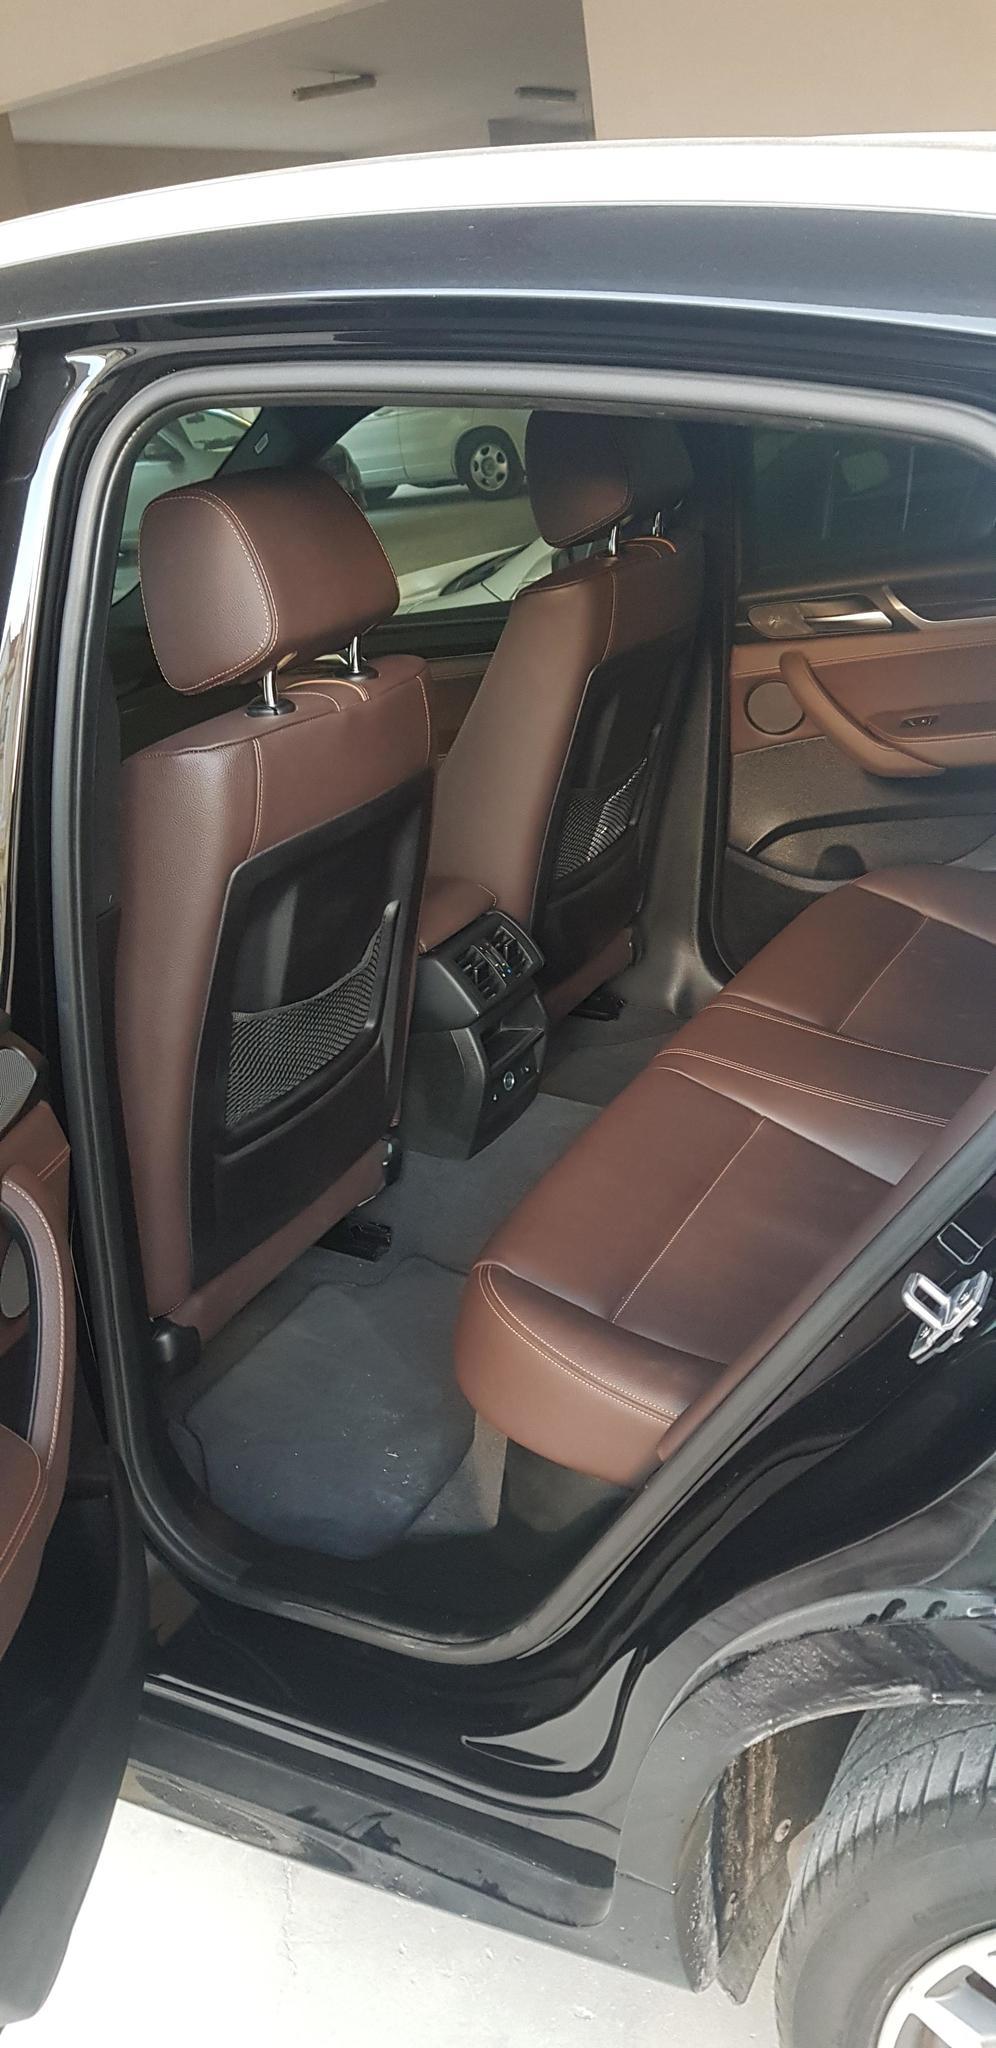 BMW X4 28I ,2016 37900 KM LADY DRIVEN NEGOTIABLE P